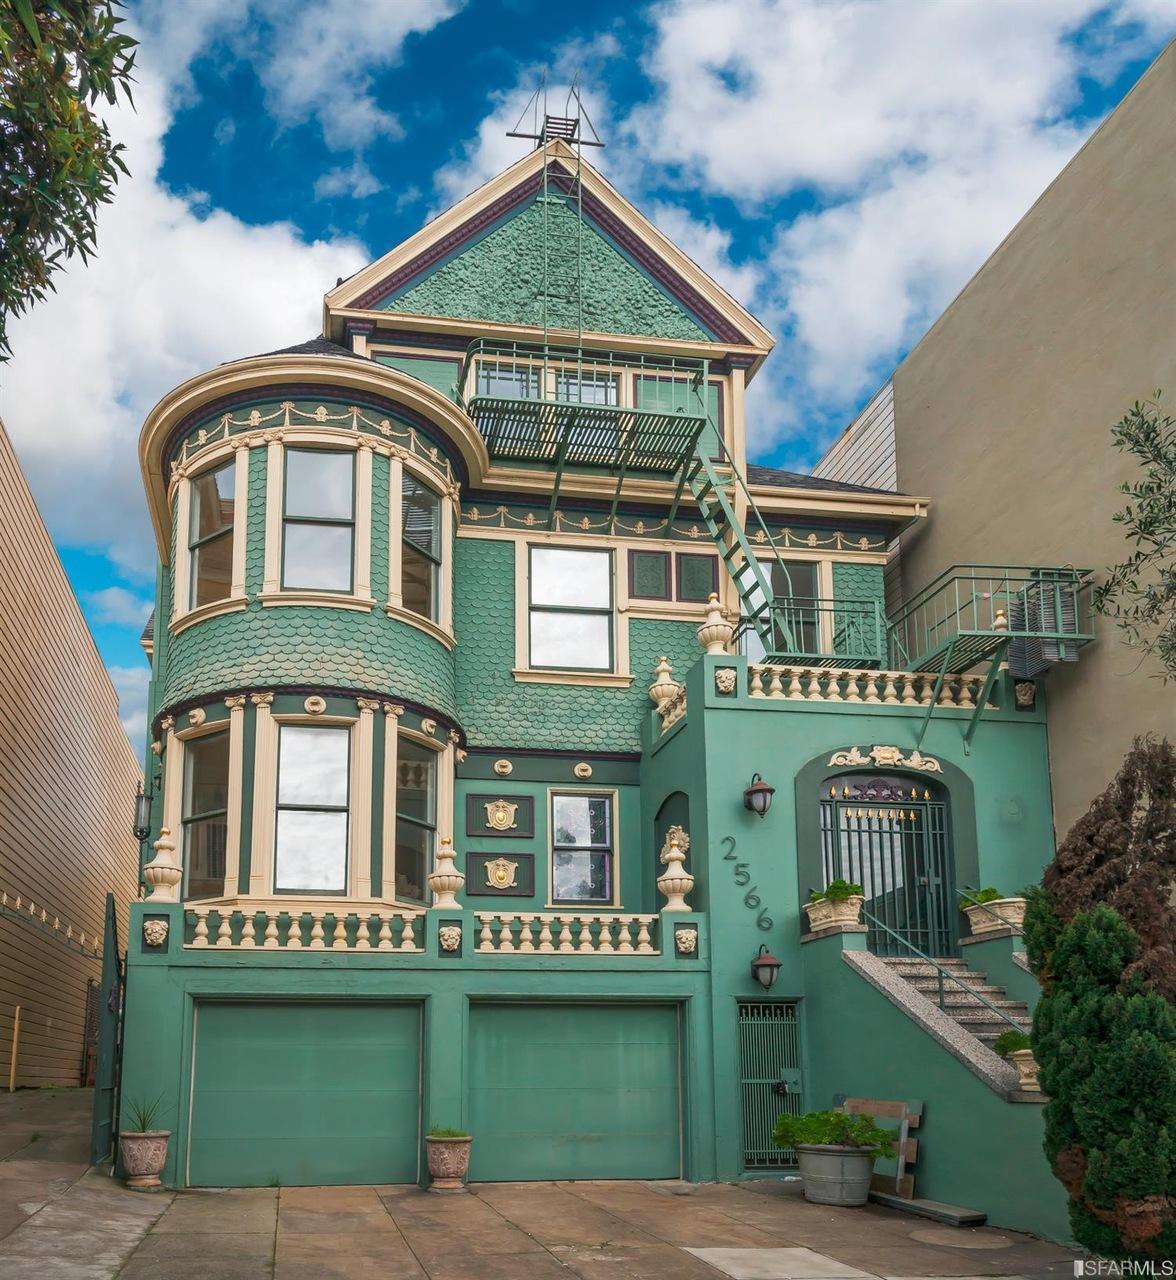 A green Queen Anne Victorian house.